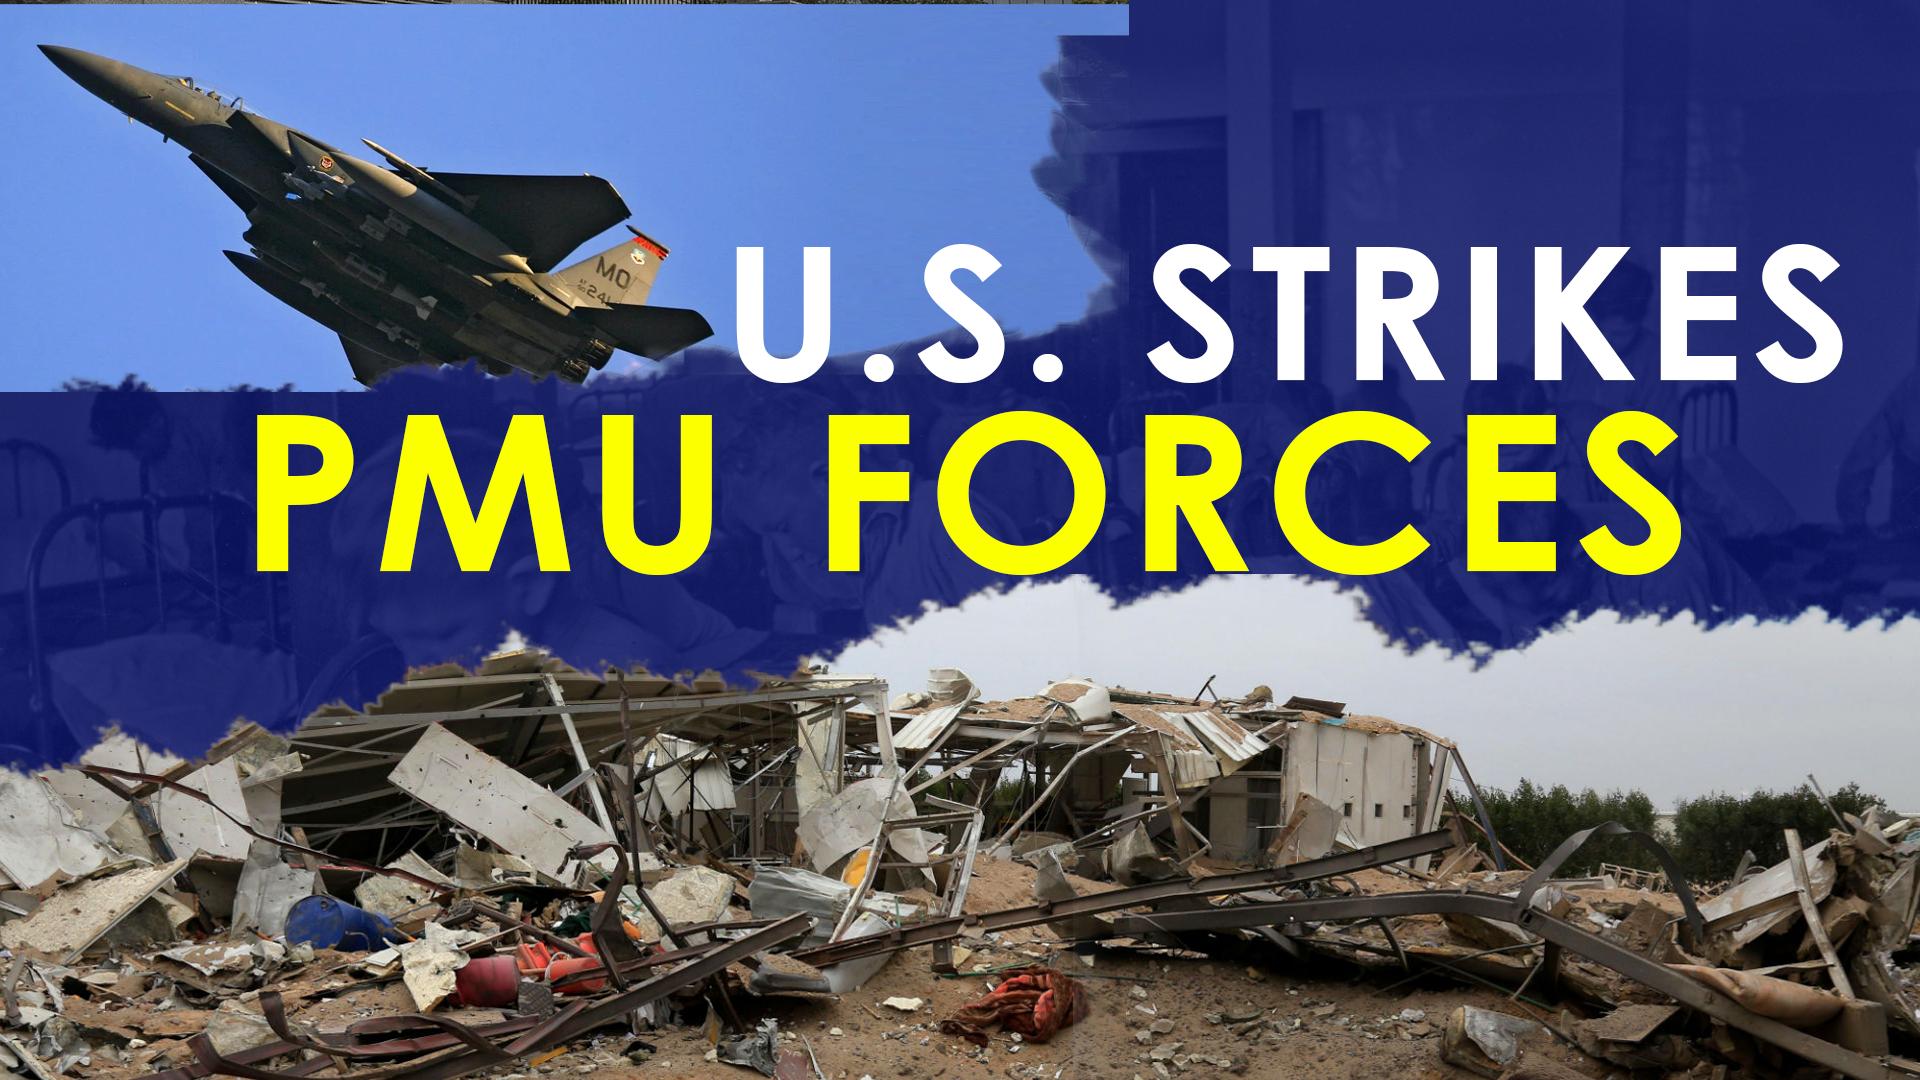 US strikes PMU forces in Iraq